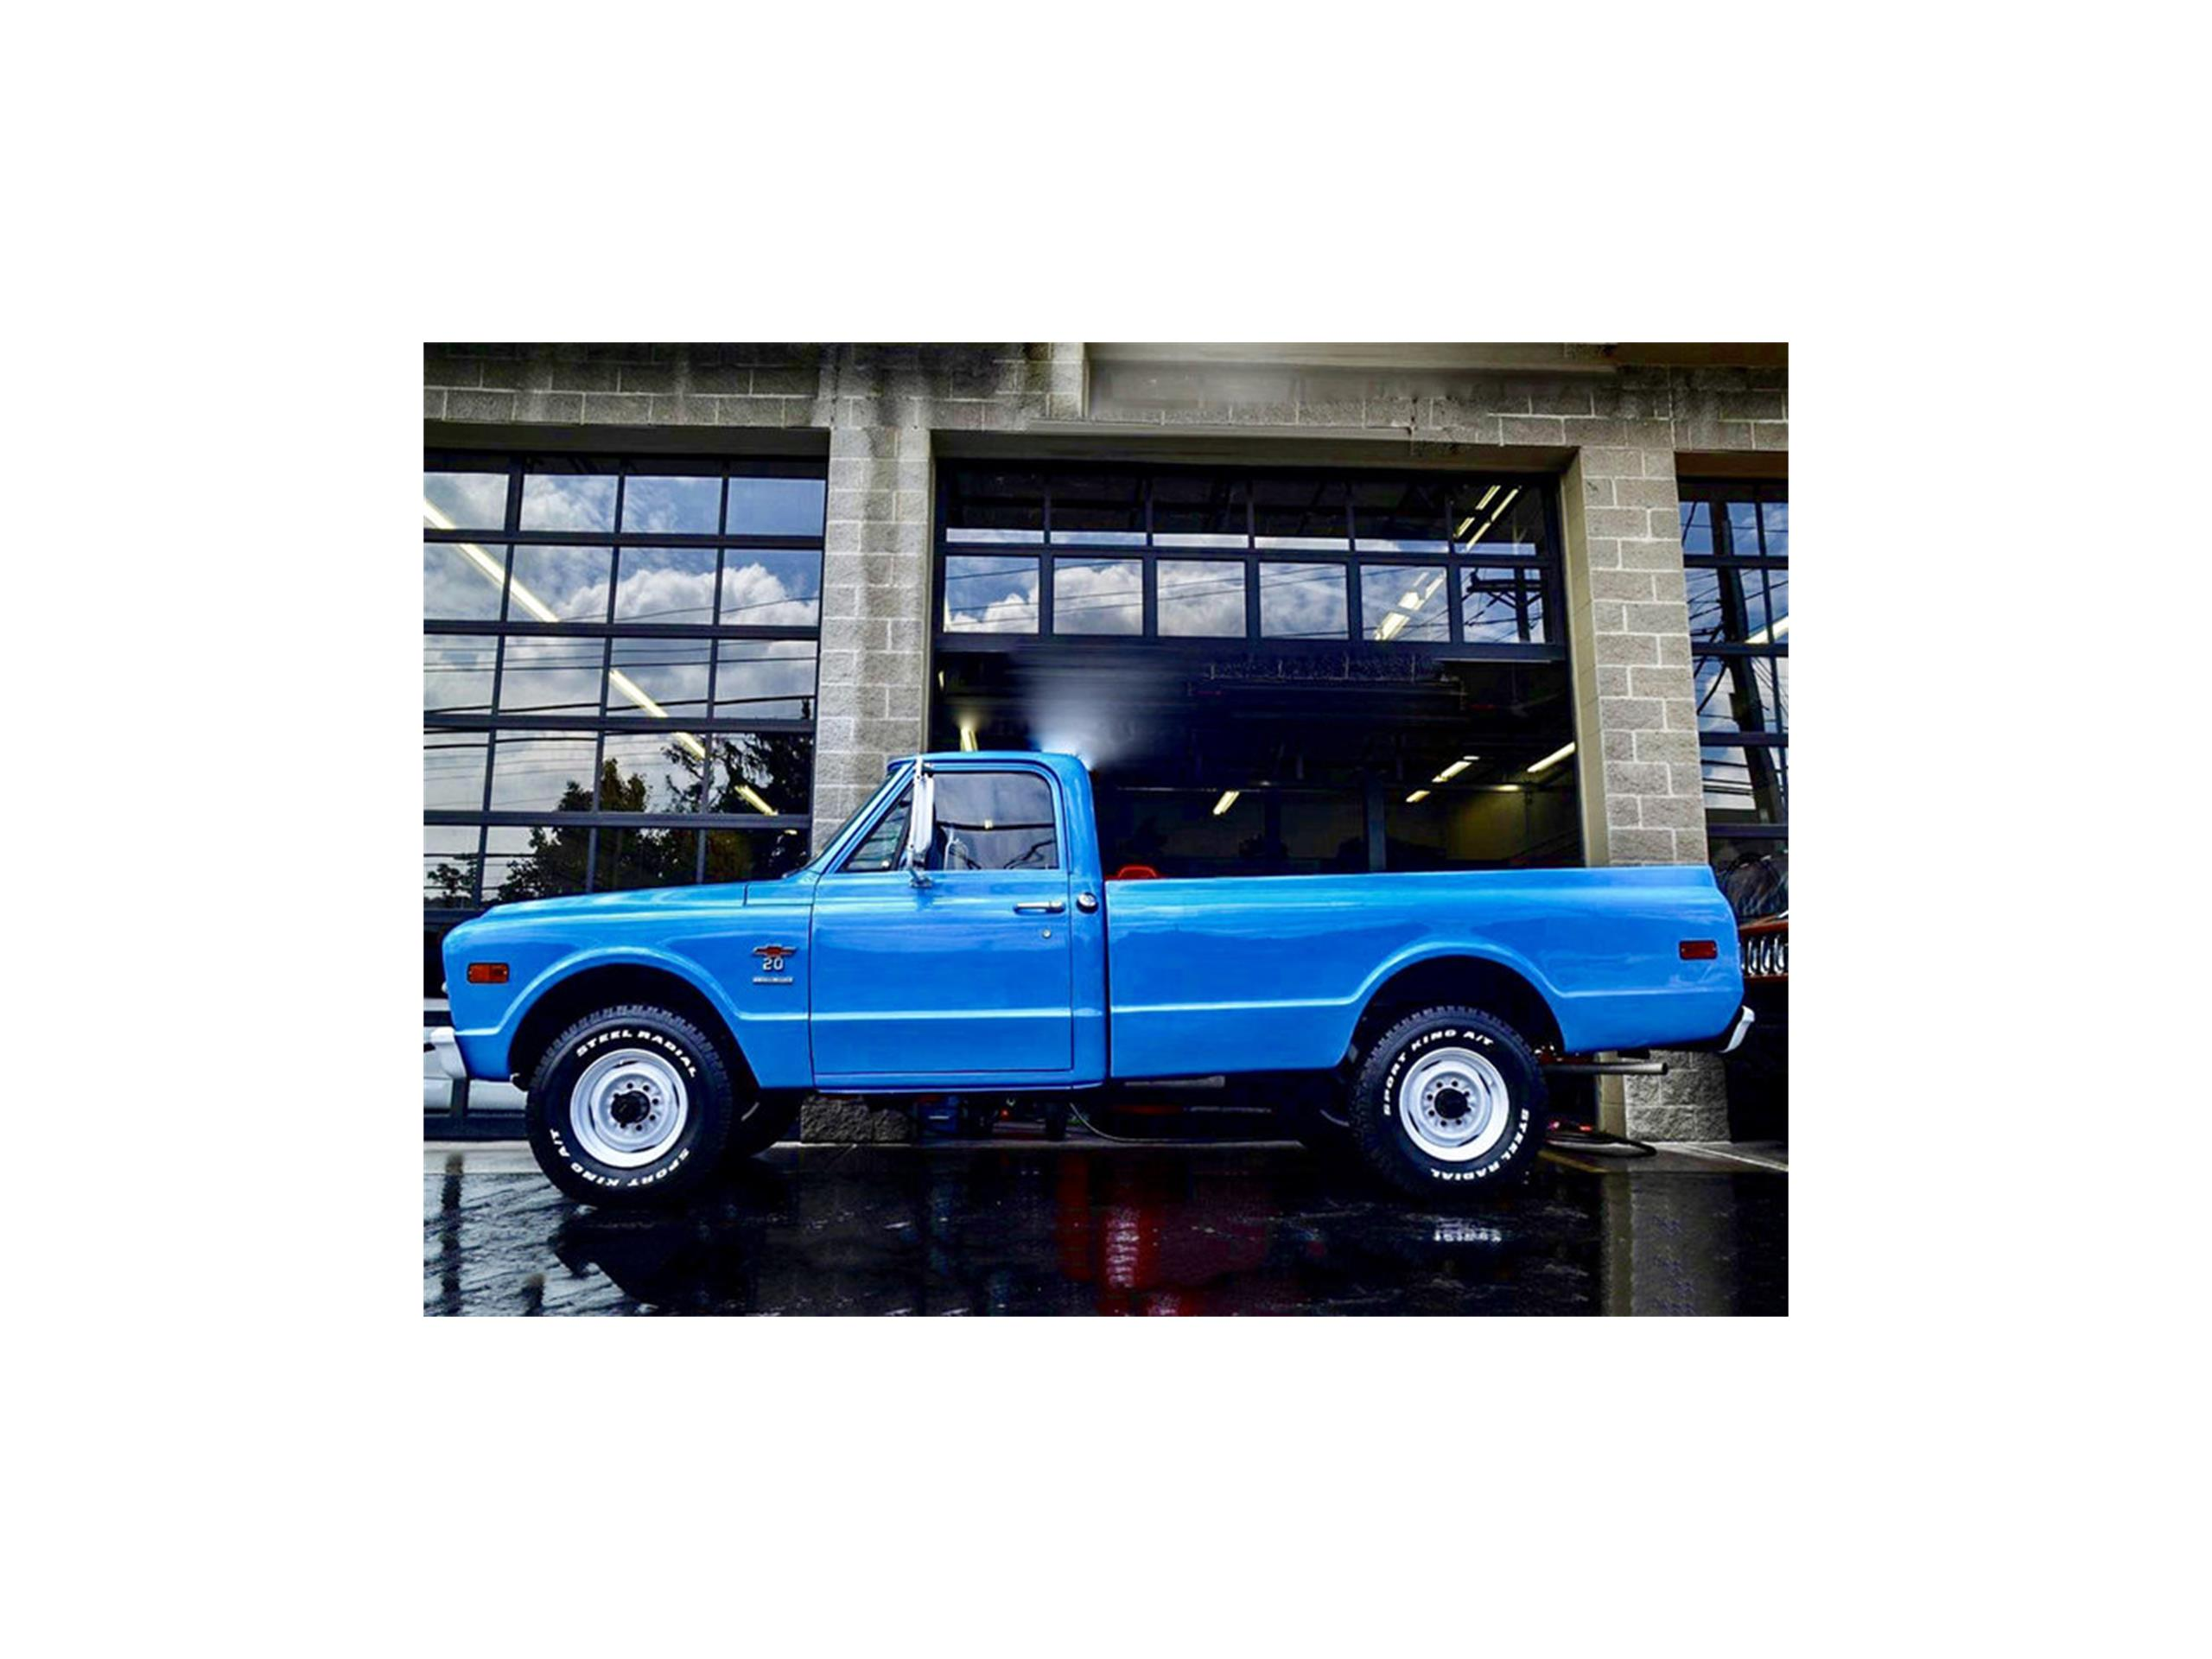 1968 Gmc 34 Ton 4x4 For Sale The Car Chevy C10 Stepside Source Chevrolet K20 3 4 Classiccars Com Cc 981995